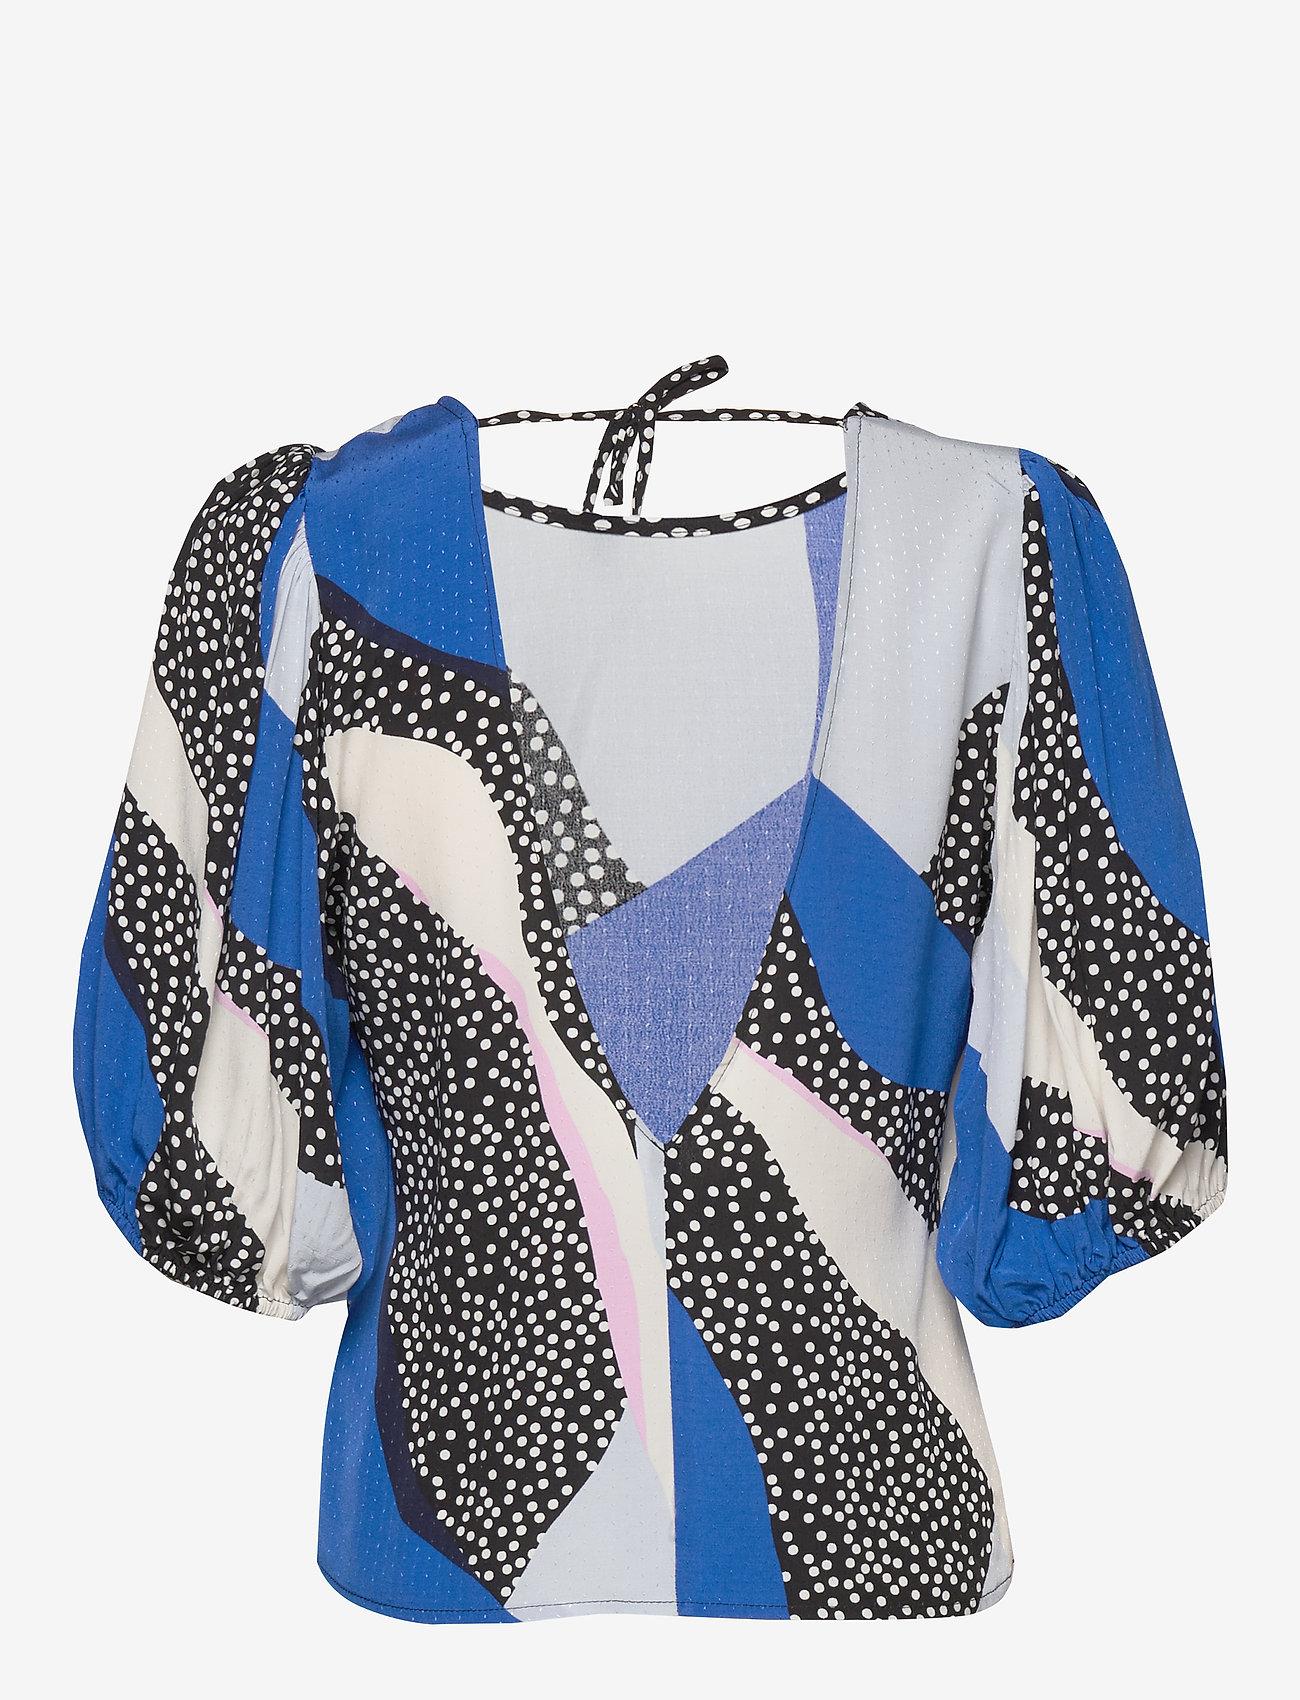 Gestuz - GlowieGZ blouse ZE2 20 - short-sleeved blouses - blue pink colorblock - 1